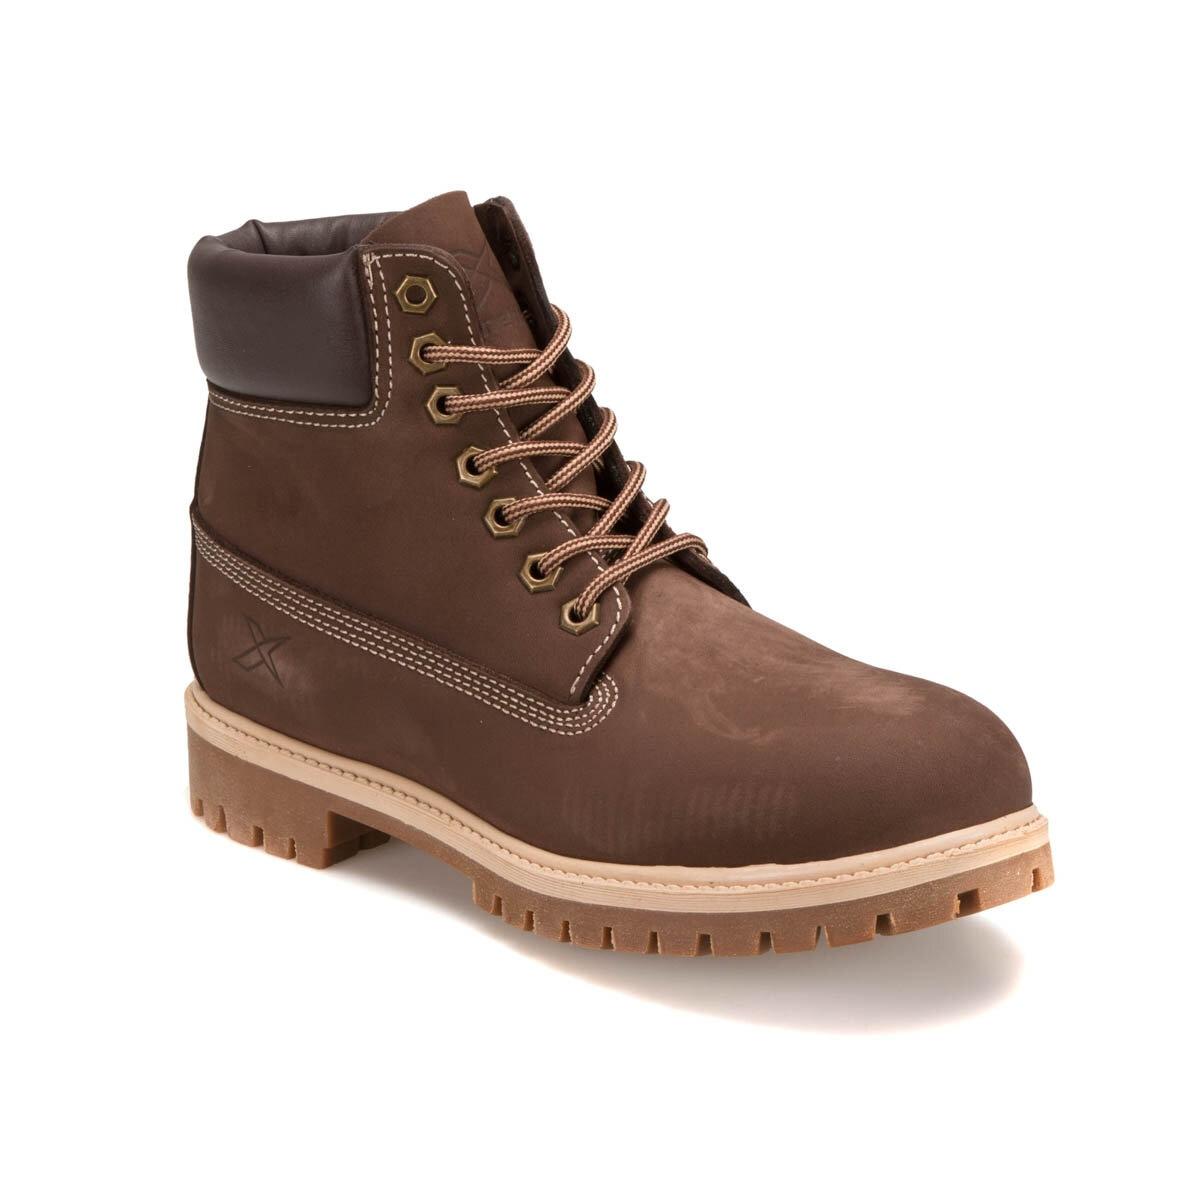 FLO A1305001 Brown Men Boots KINETIX